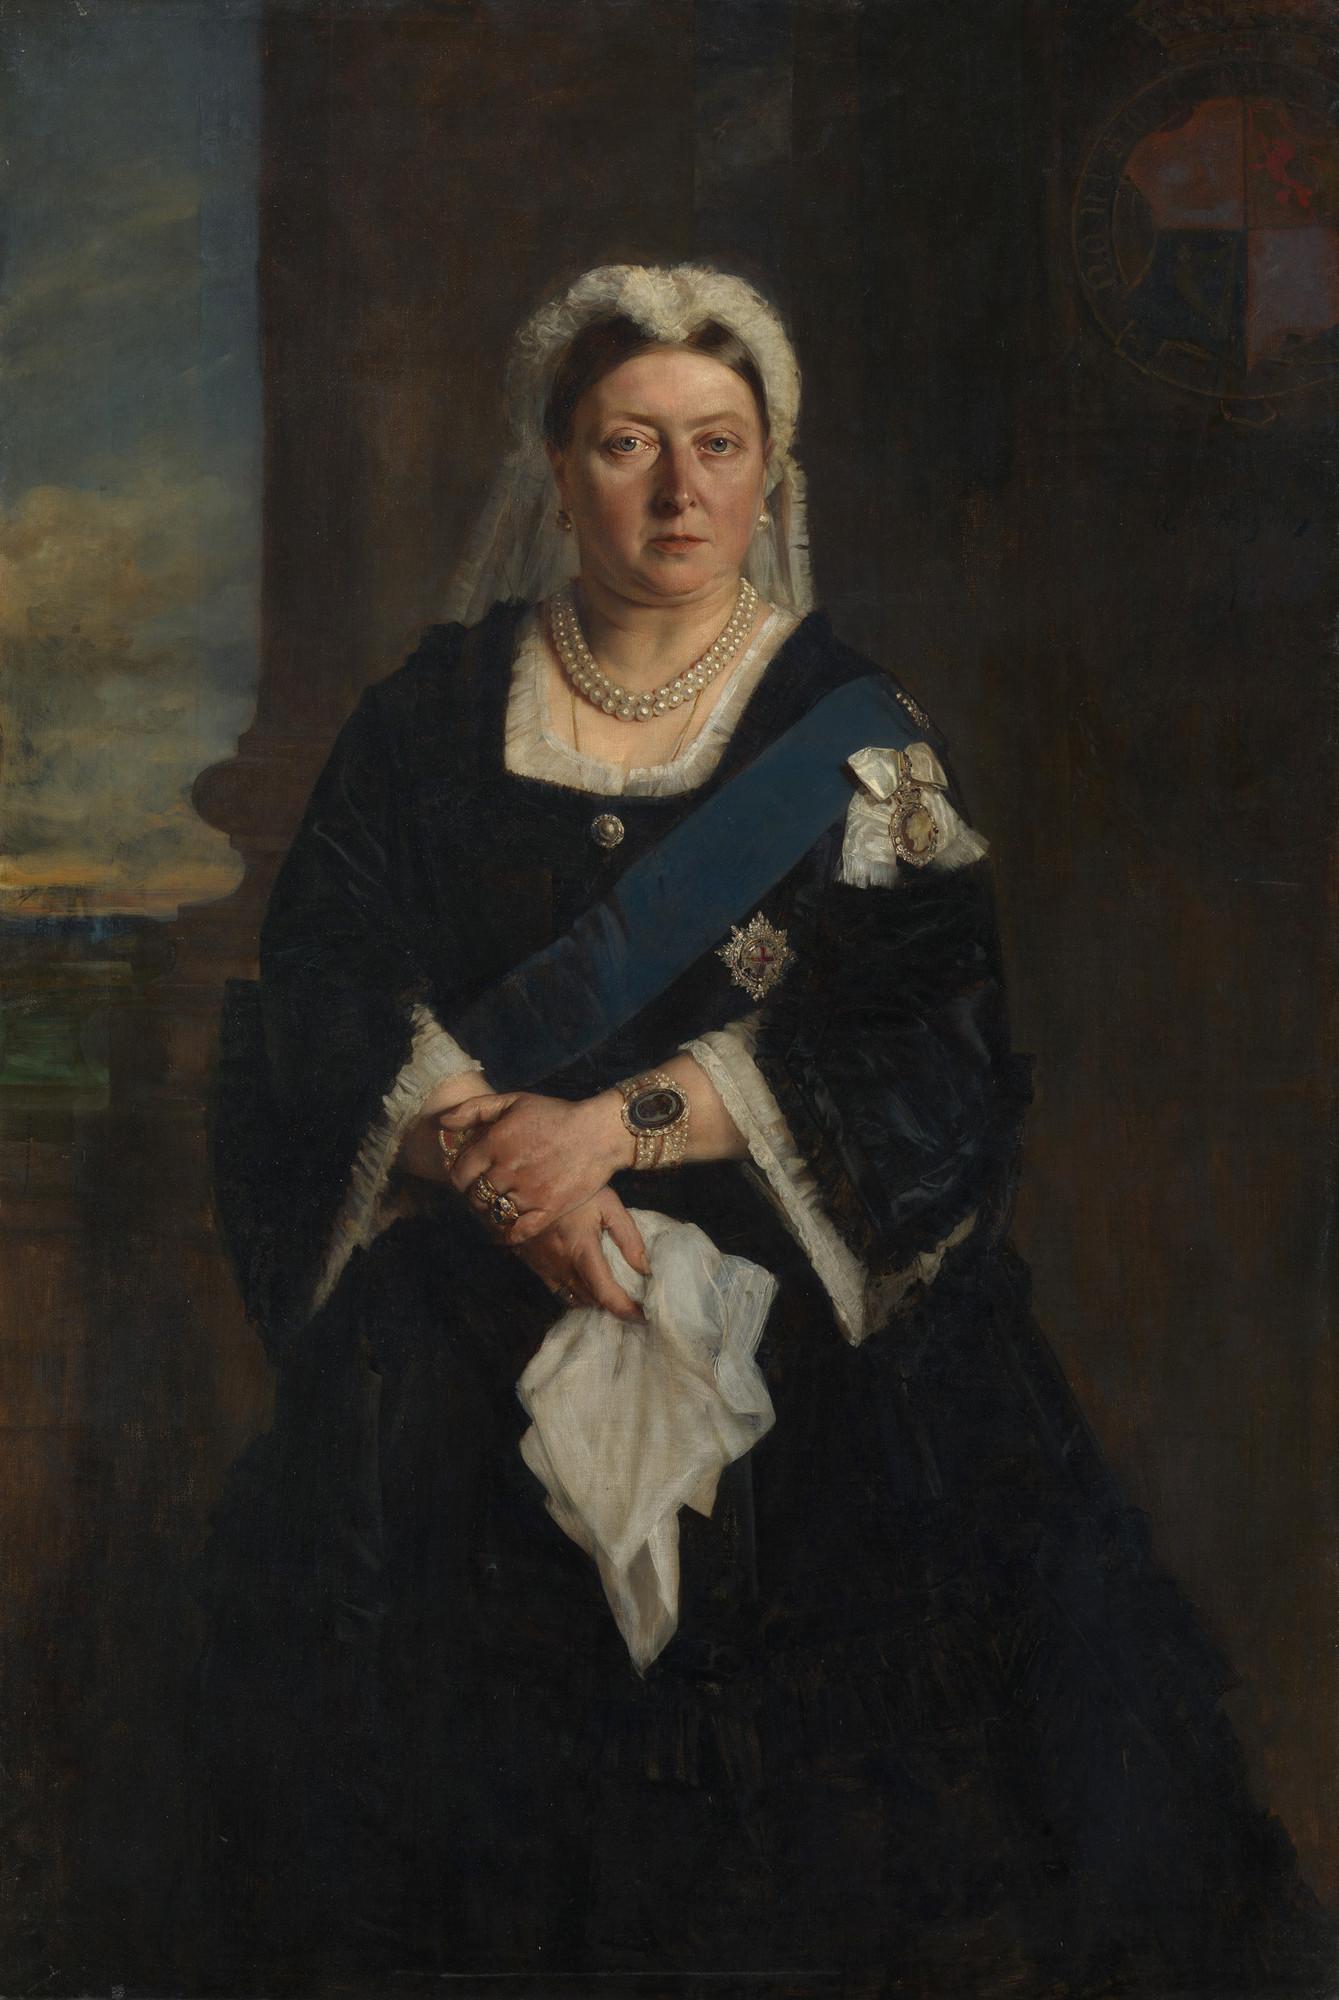 File:Queen Victoria - Von Angeli 1885.jpg - Wikimedia Commons